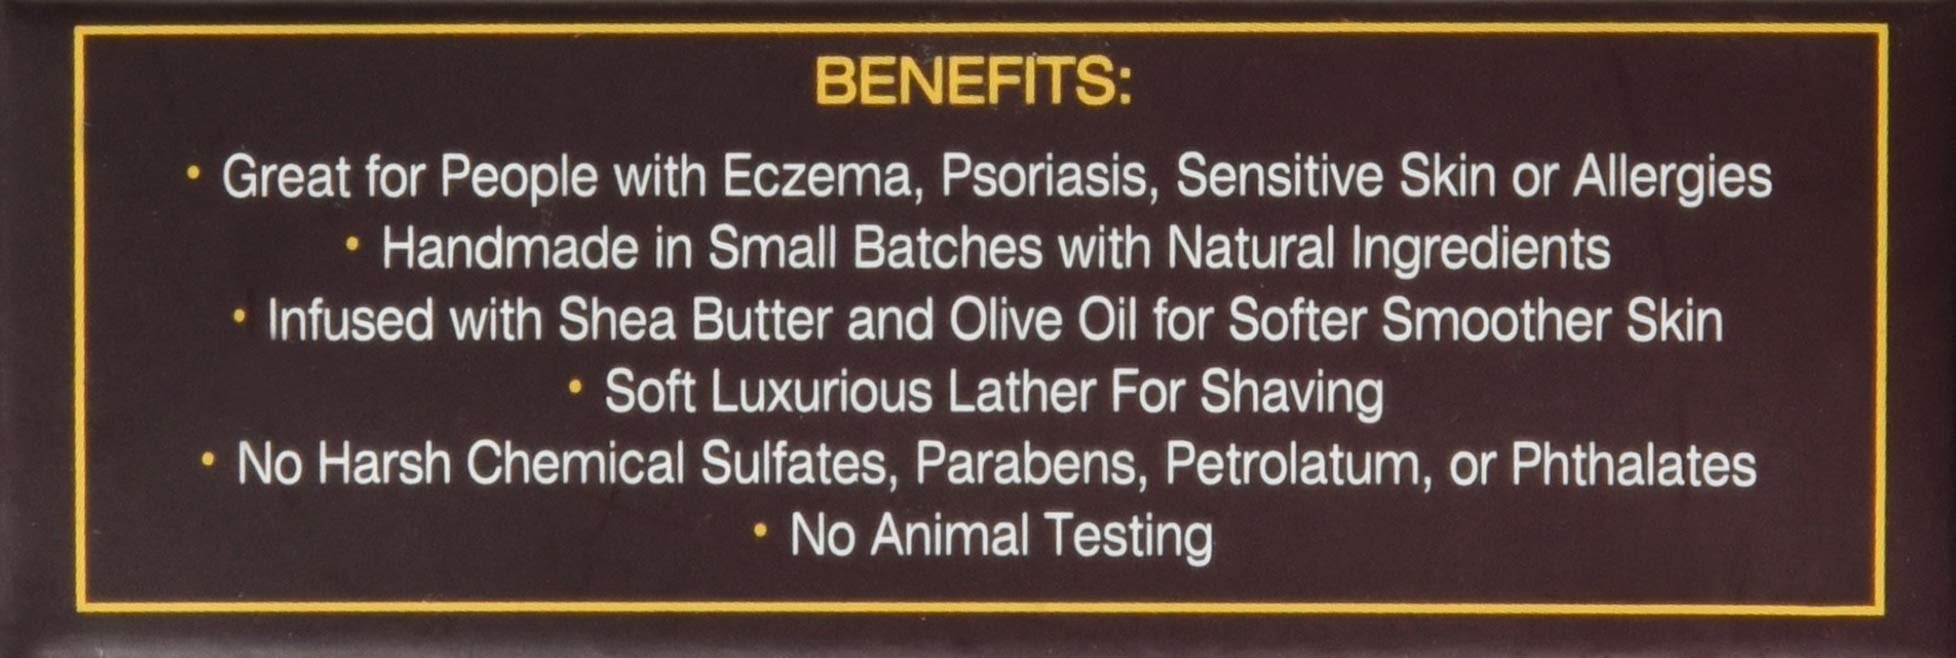 tgin Natural Olive Oil Soap With Shea Butter - Sugar Pear Bar - 4 Oz